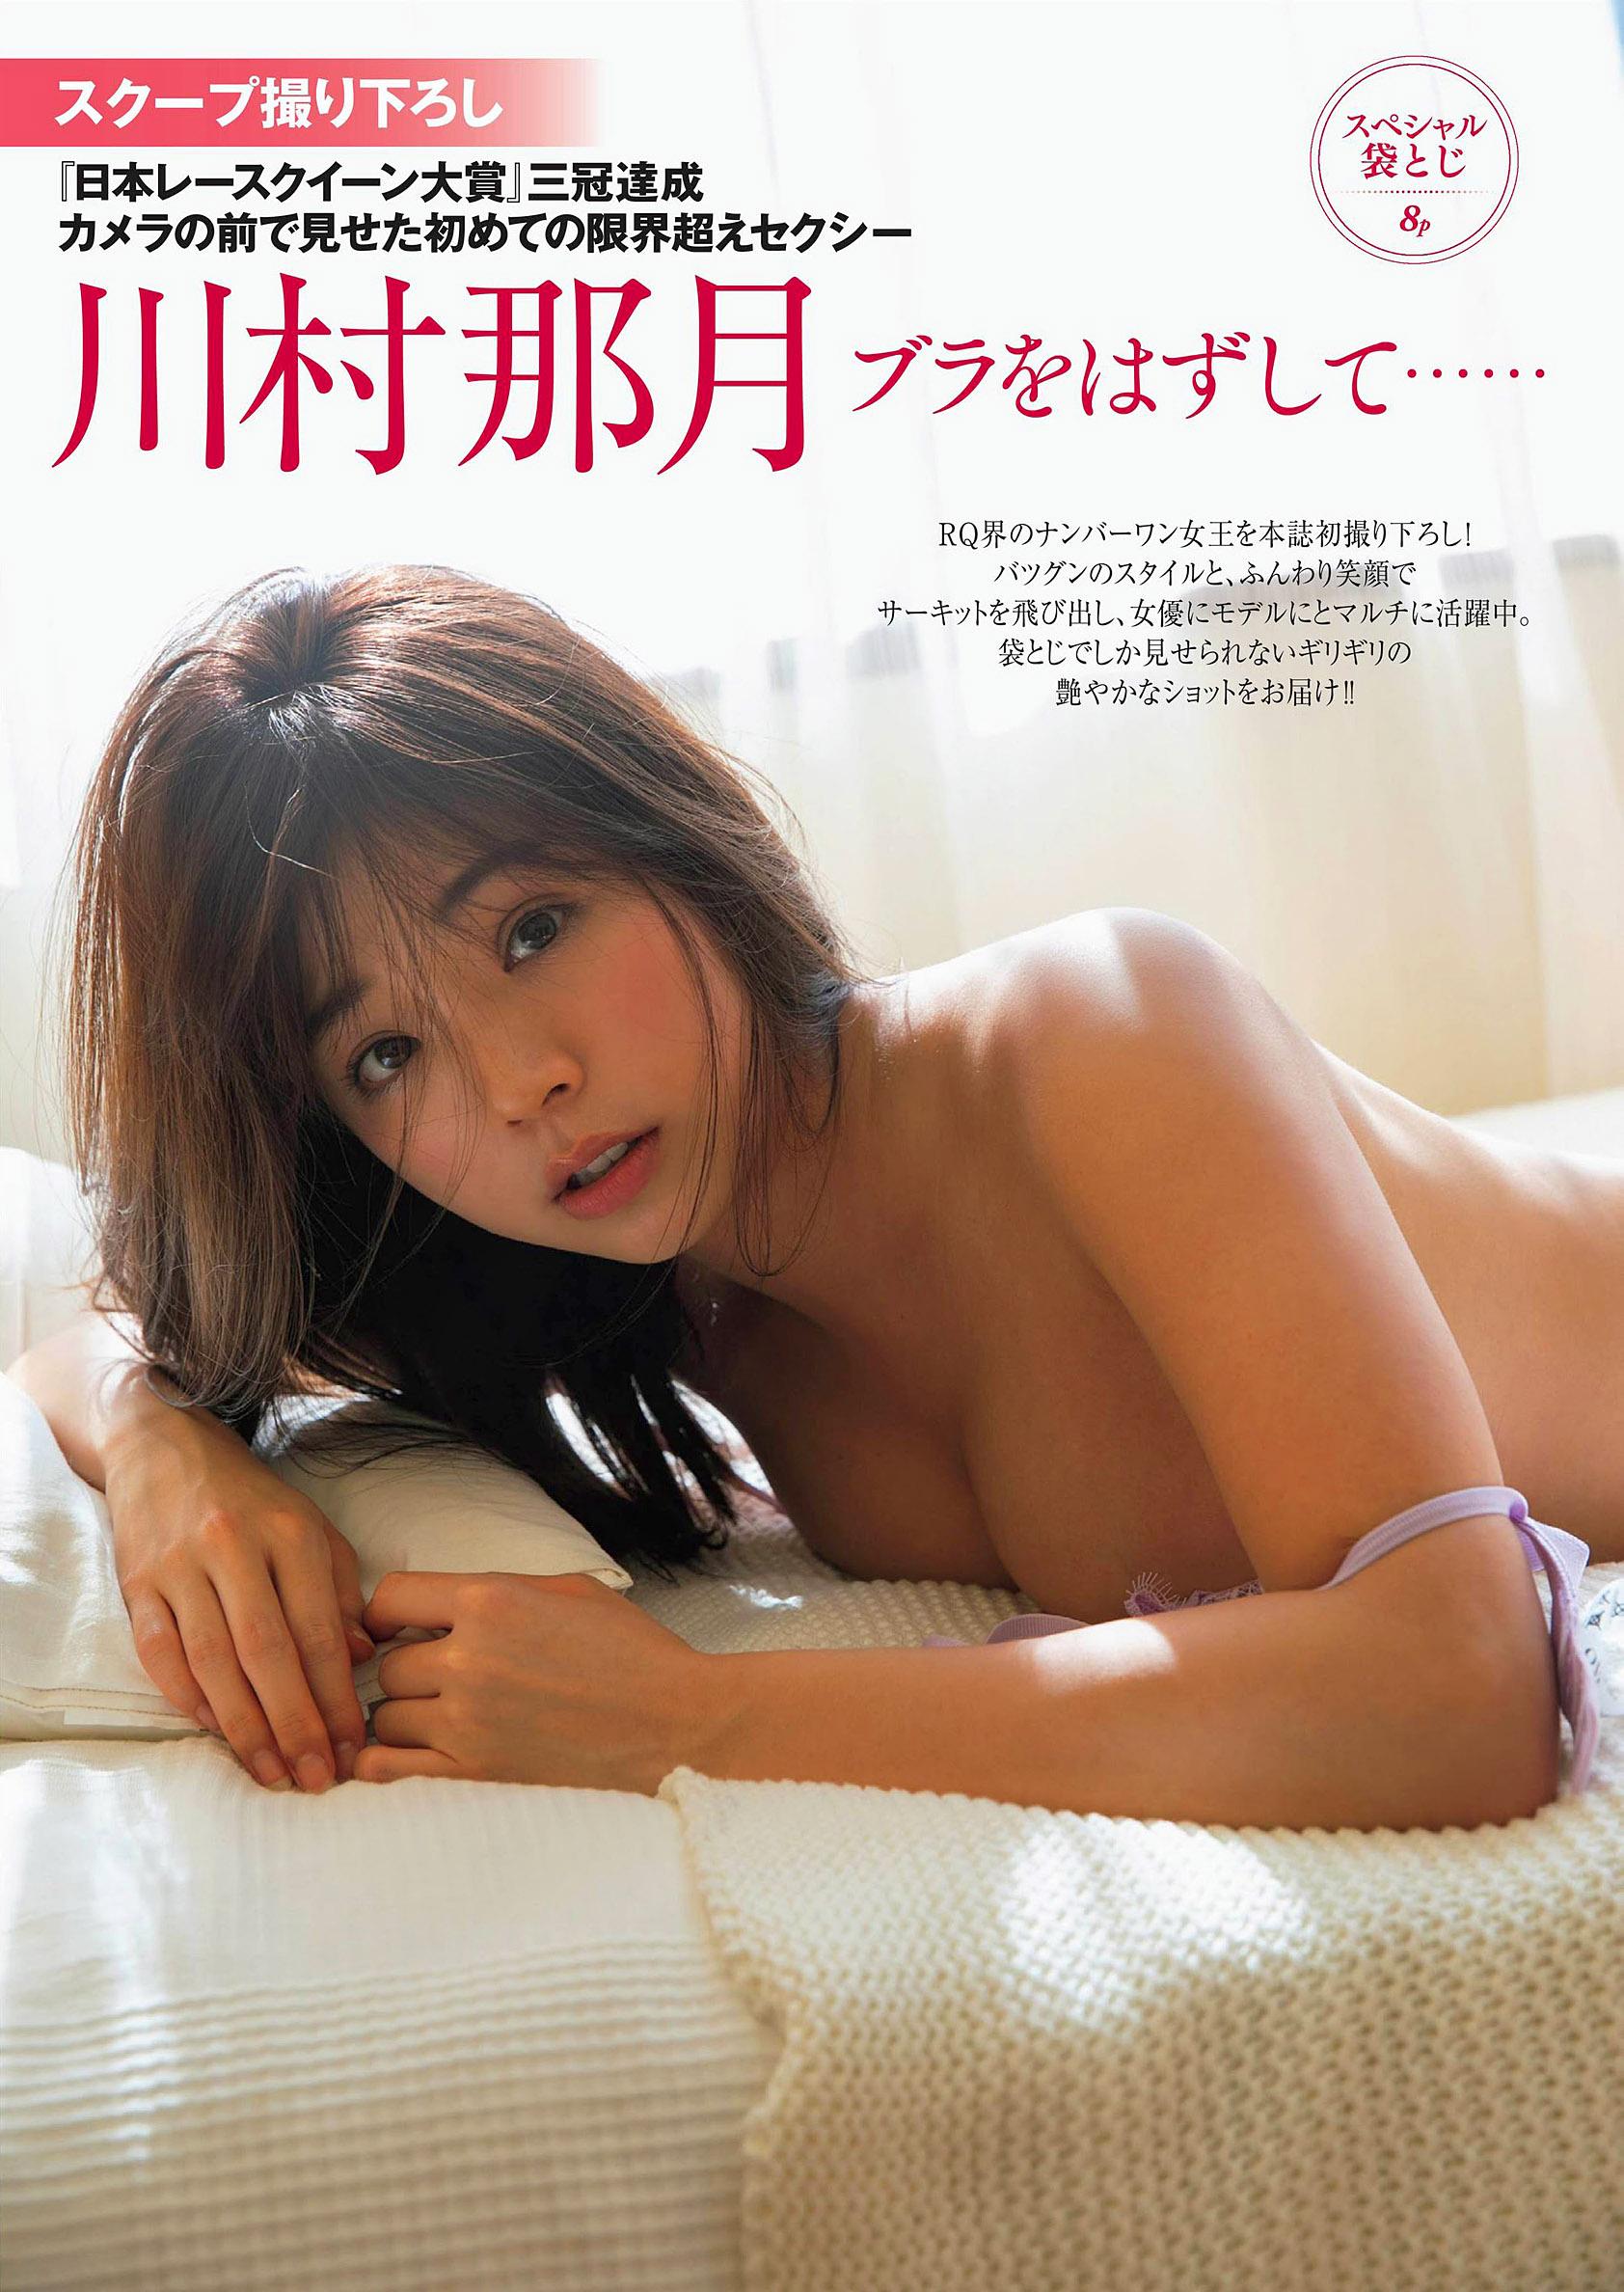 Natsuki Kawamura Friday 200327 01.jpg